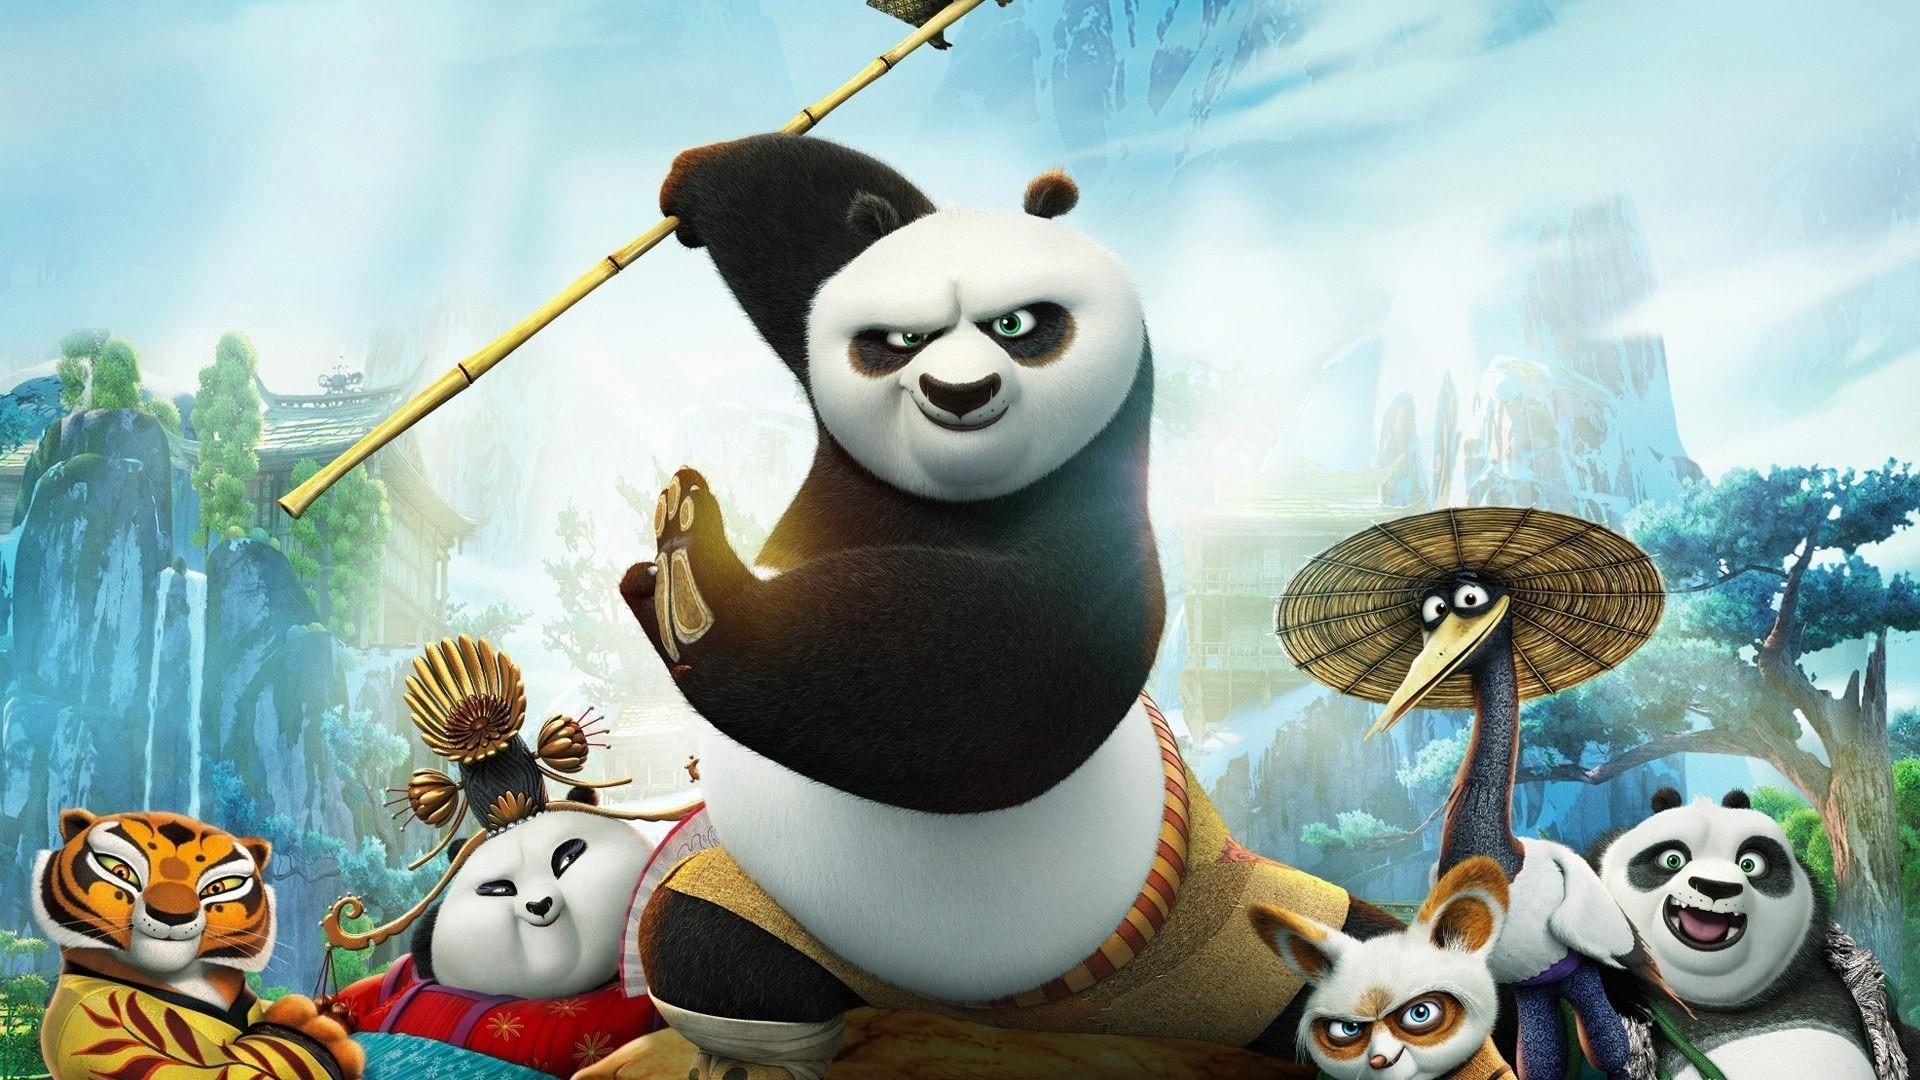 Kung Fu Panda hd wallpaper for laptop